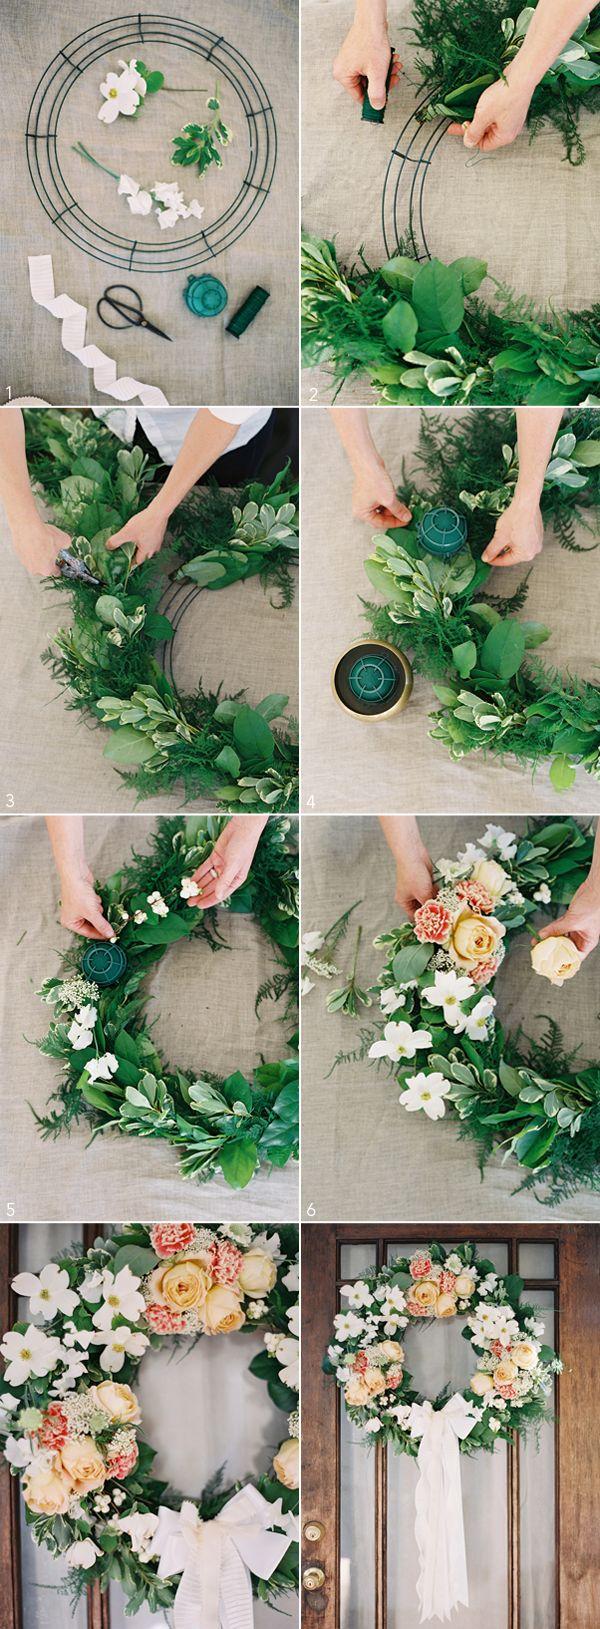 Diy Wedding Decor Ideas 20 Creative Diy Wedding Ideas For 2016 Spring